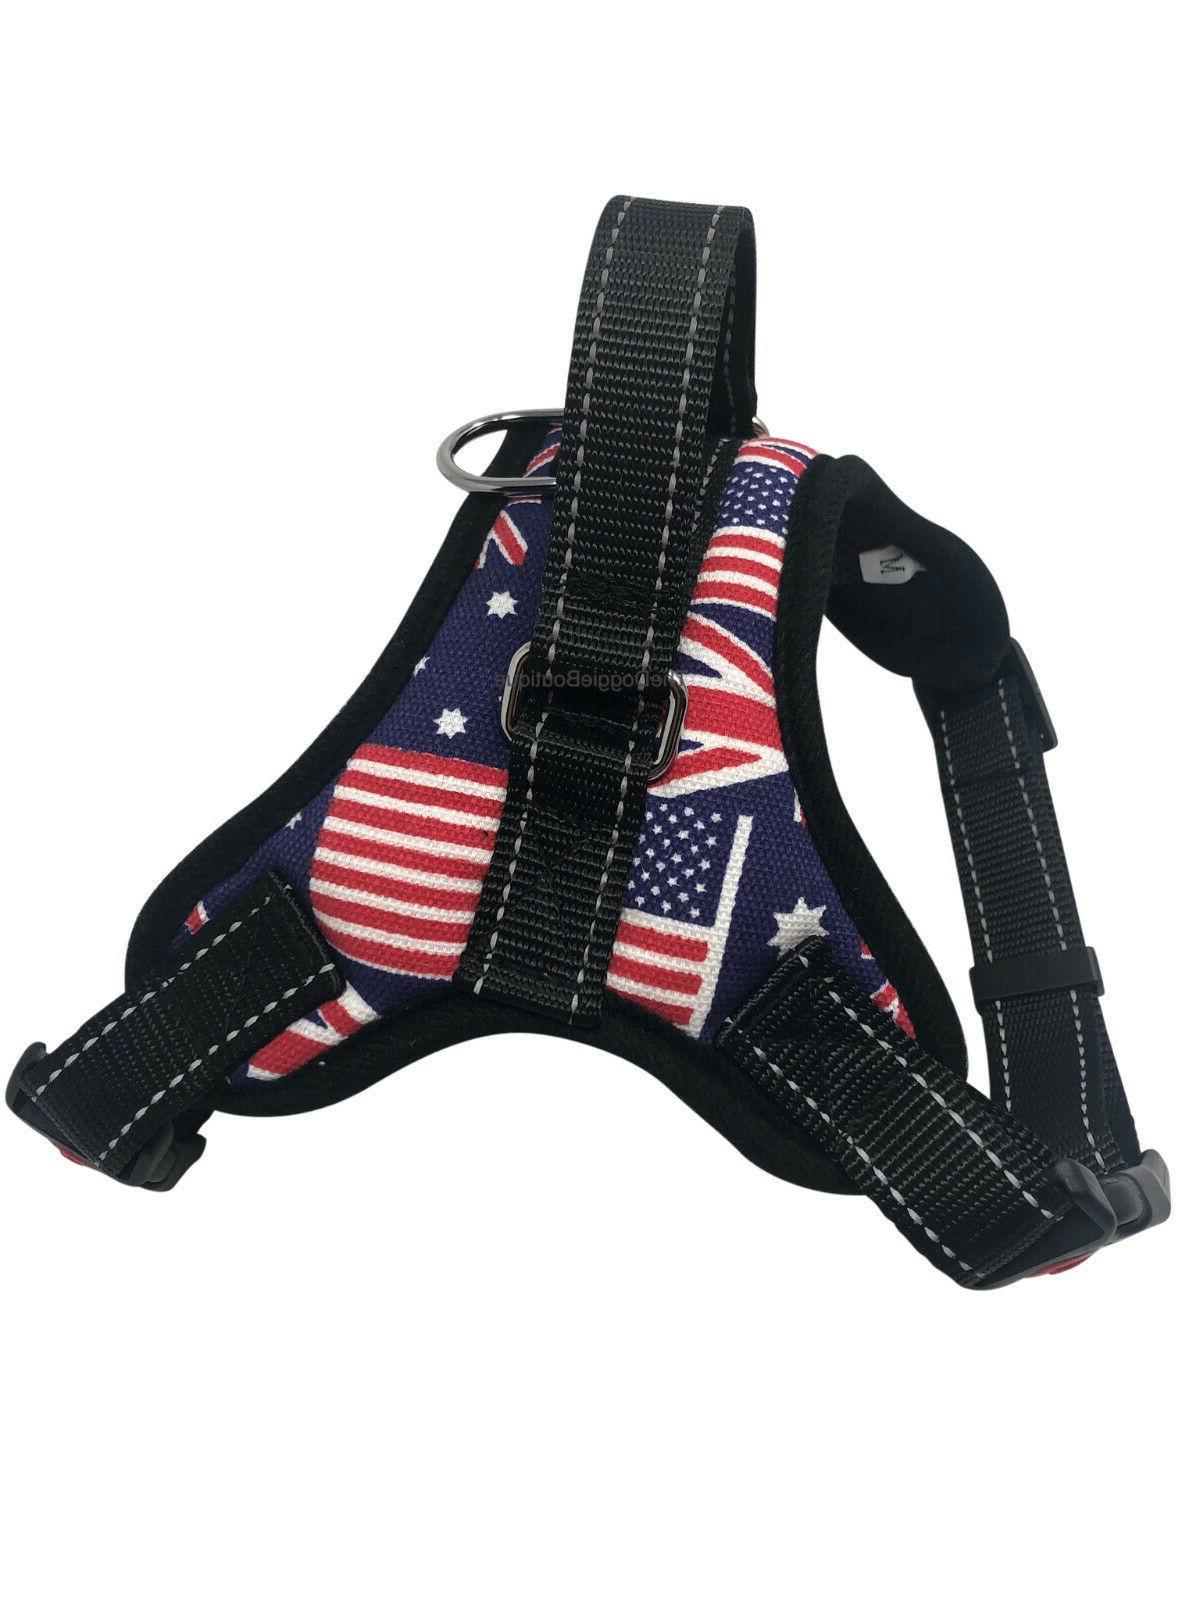 No Pull Pet Vest Harness Adjustable, Quality, M